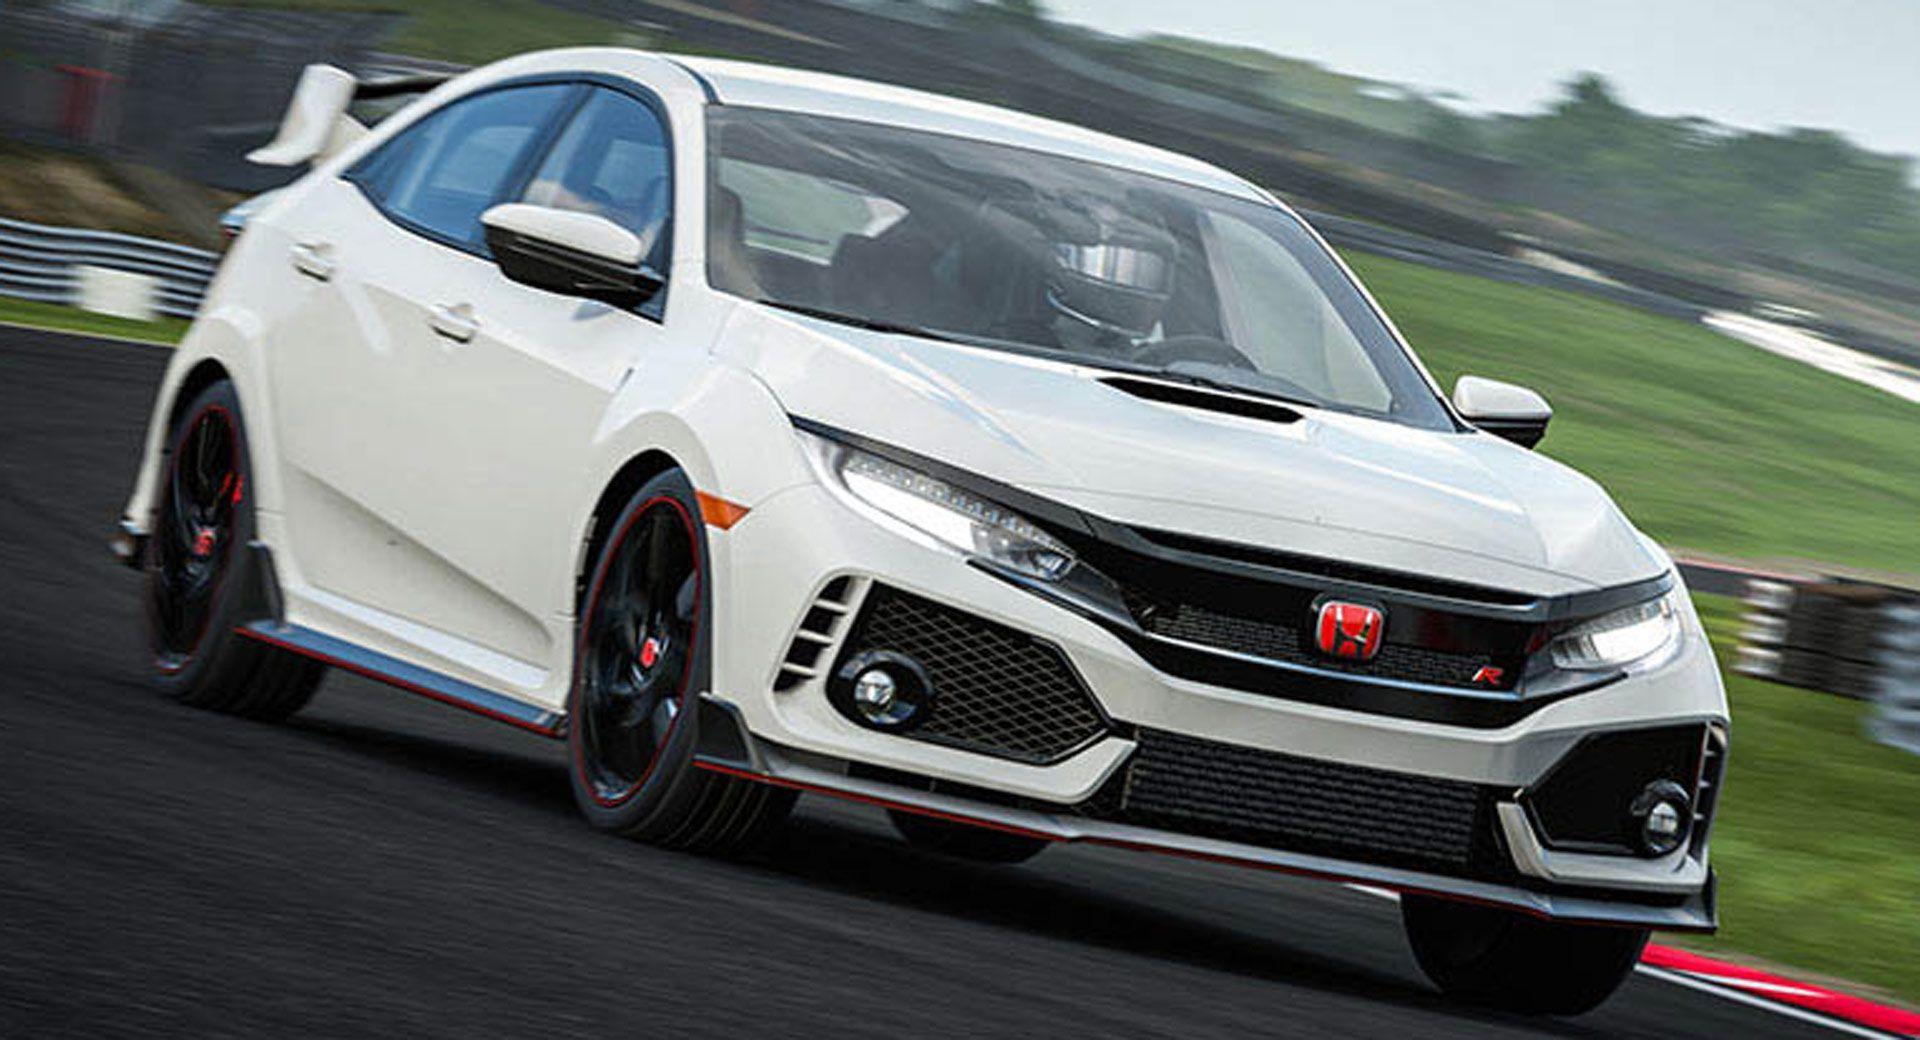 Honda Civic Type R Hits Forza Motorsport 7 In Latest Update Carscoops Honda Civic Type R Honda Civic Forza Motorsport